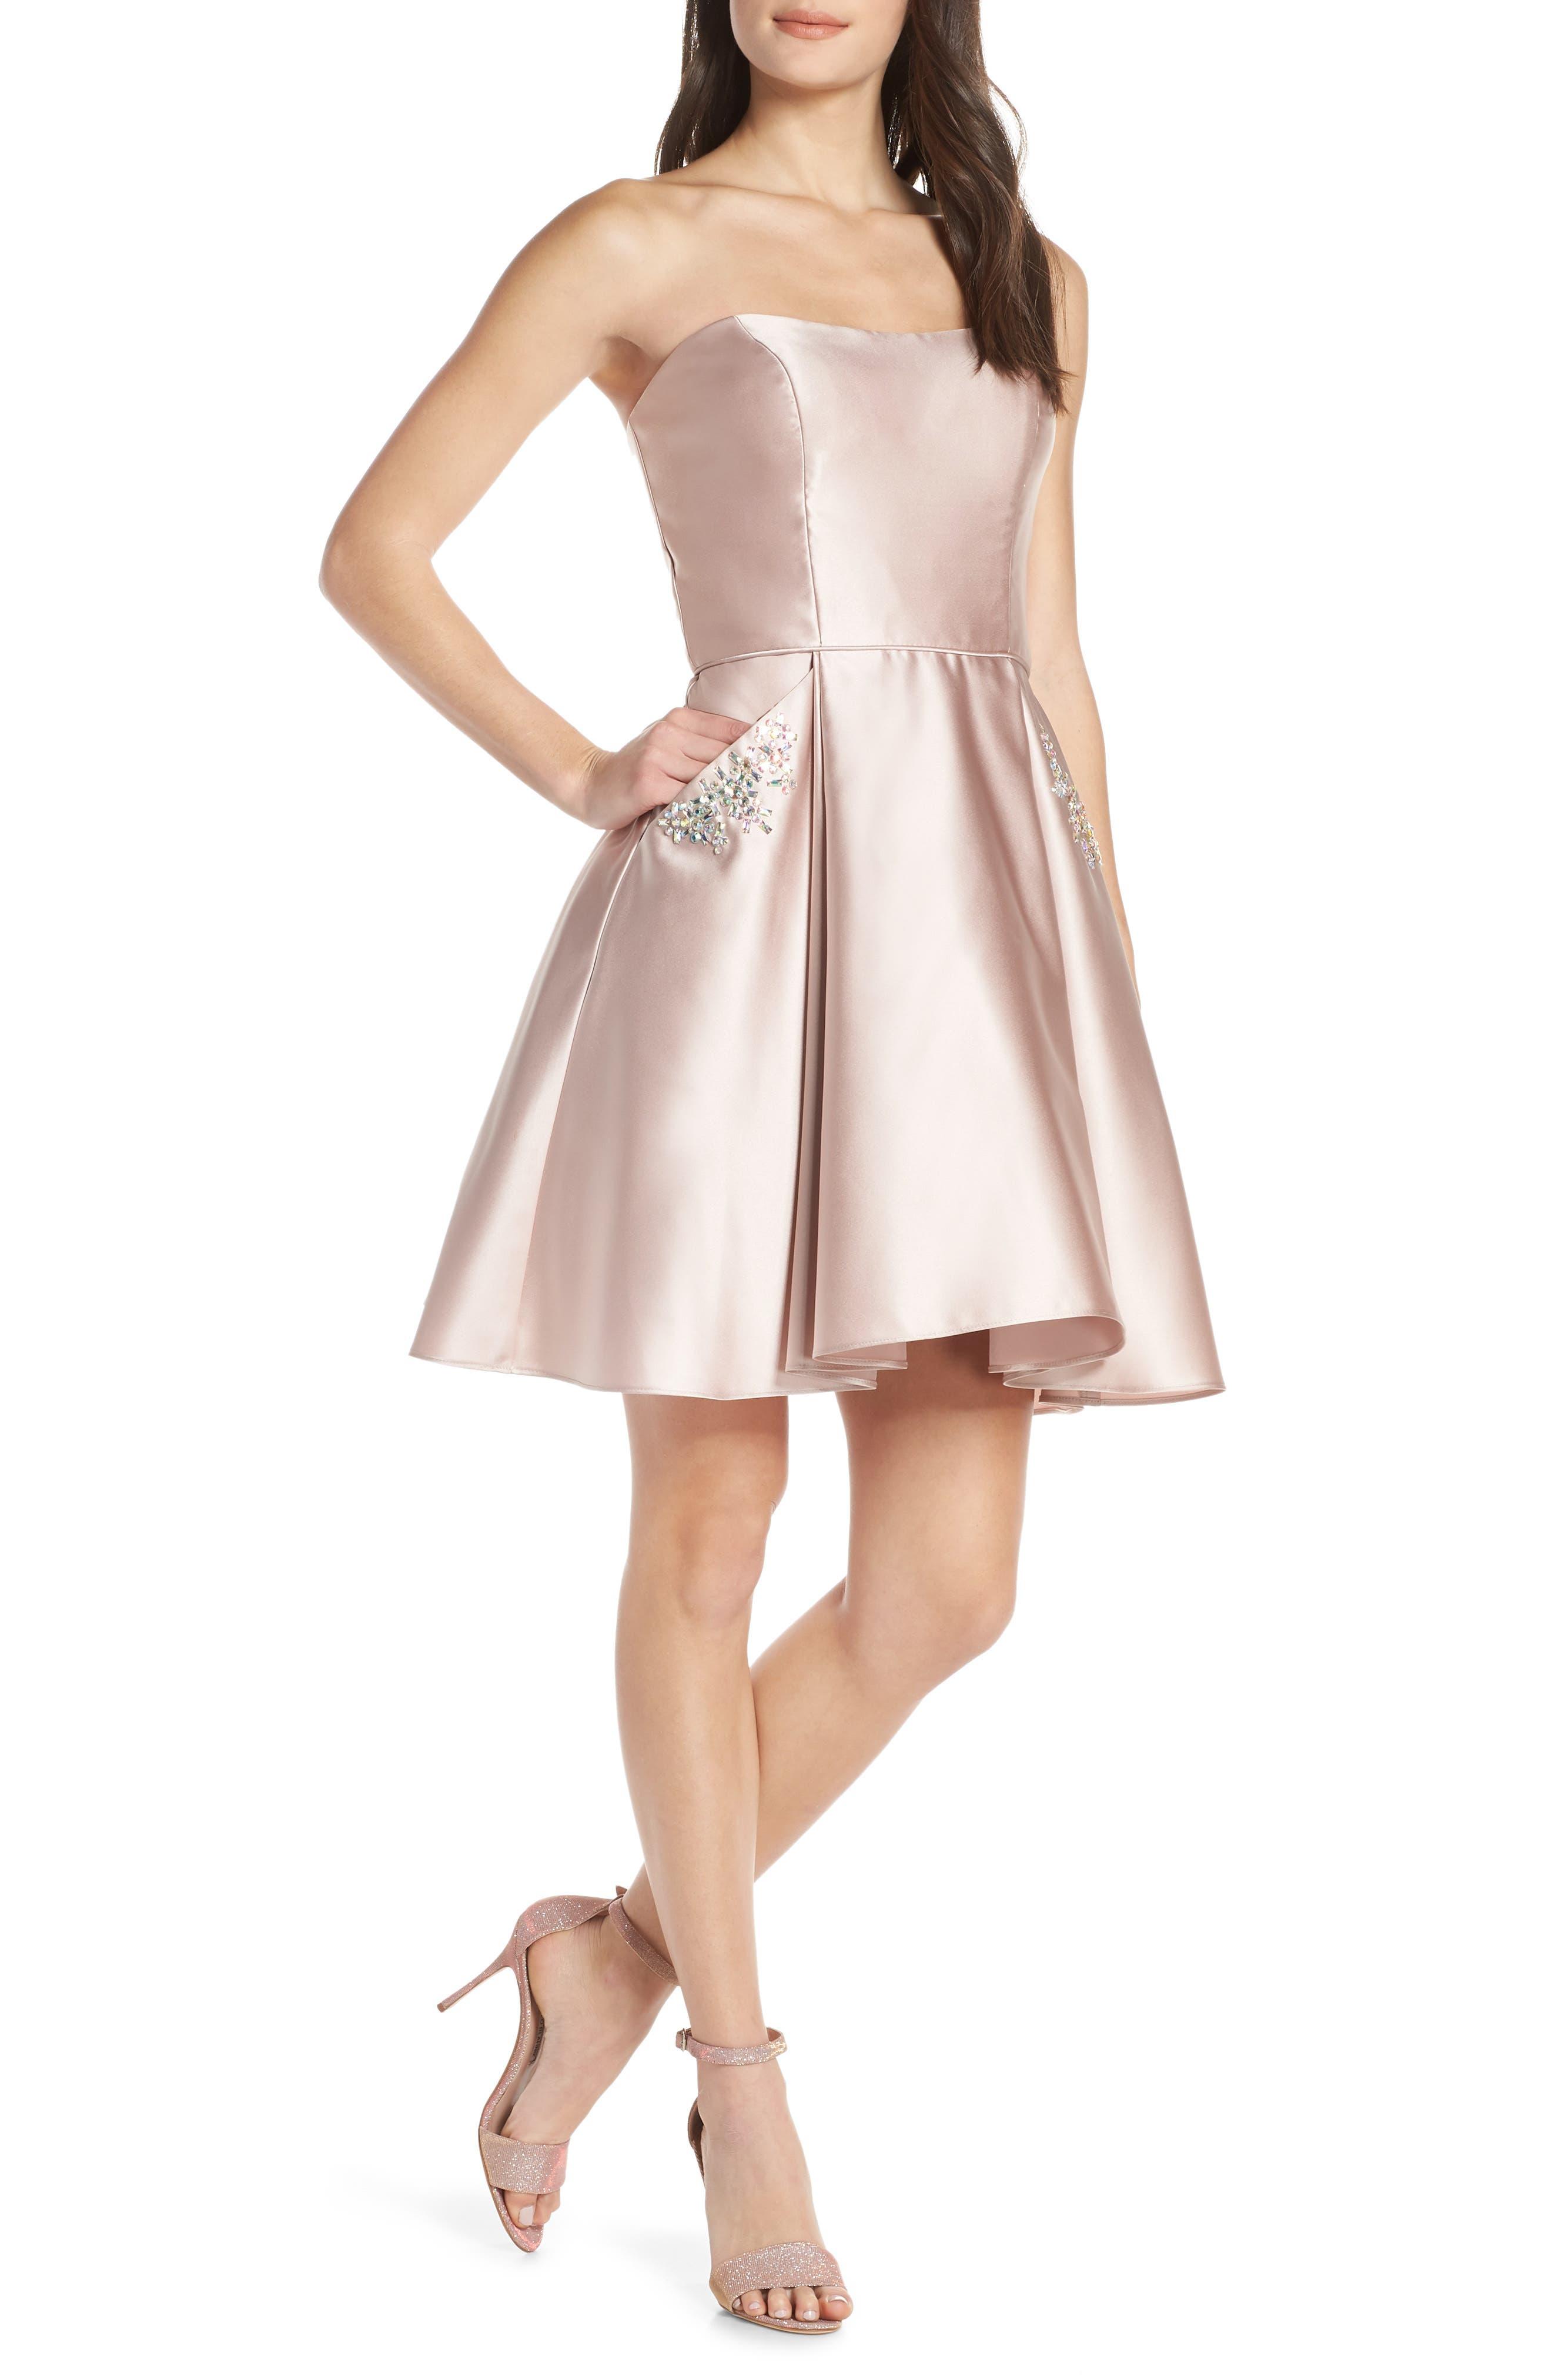 BLONDIE NITES,                             Embellished Satin Fit & Flare Dress,                             Main thumbnail 1, color,                             BEIGE